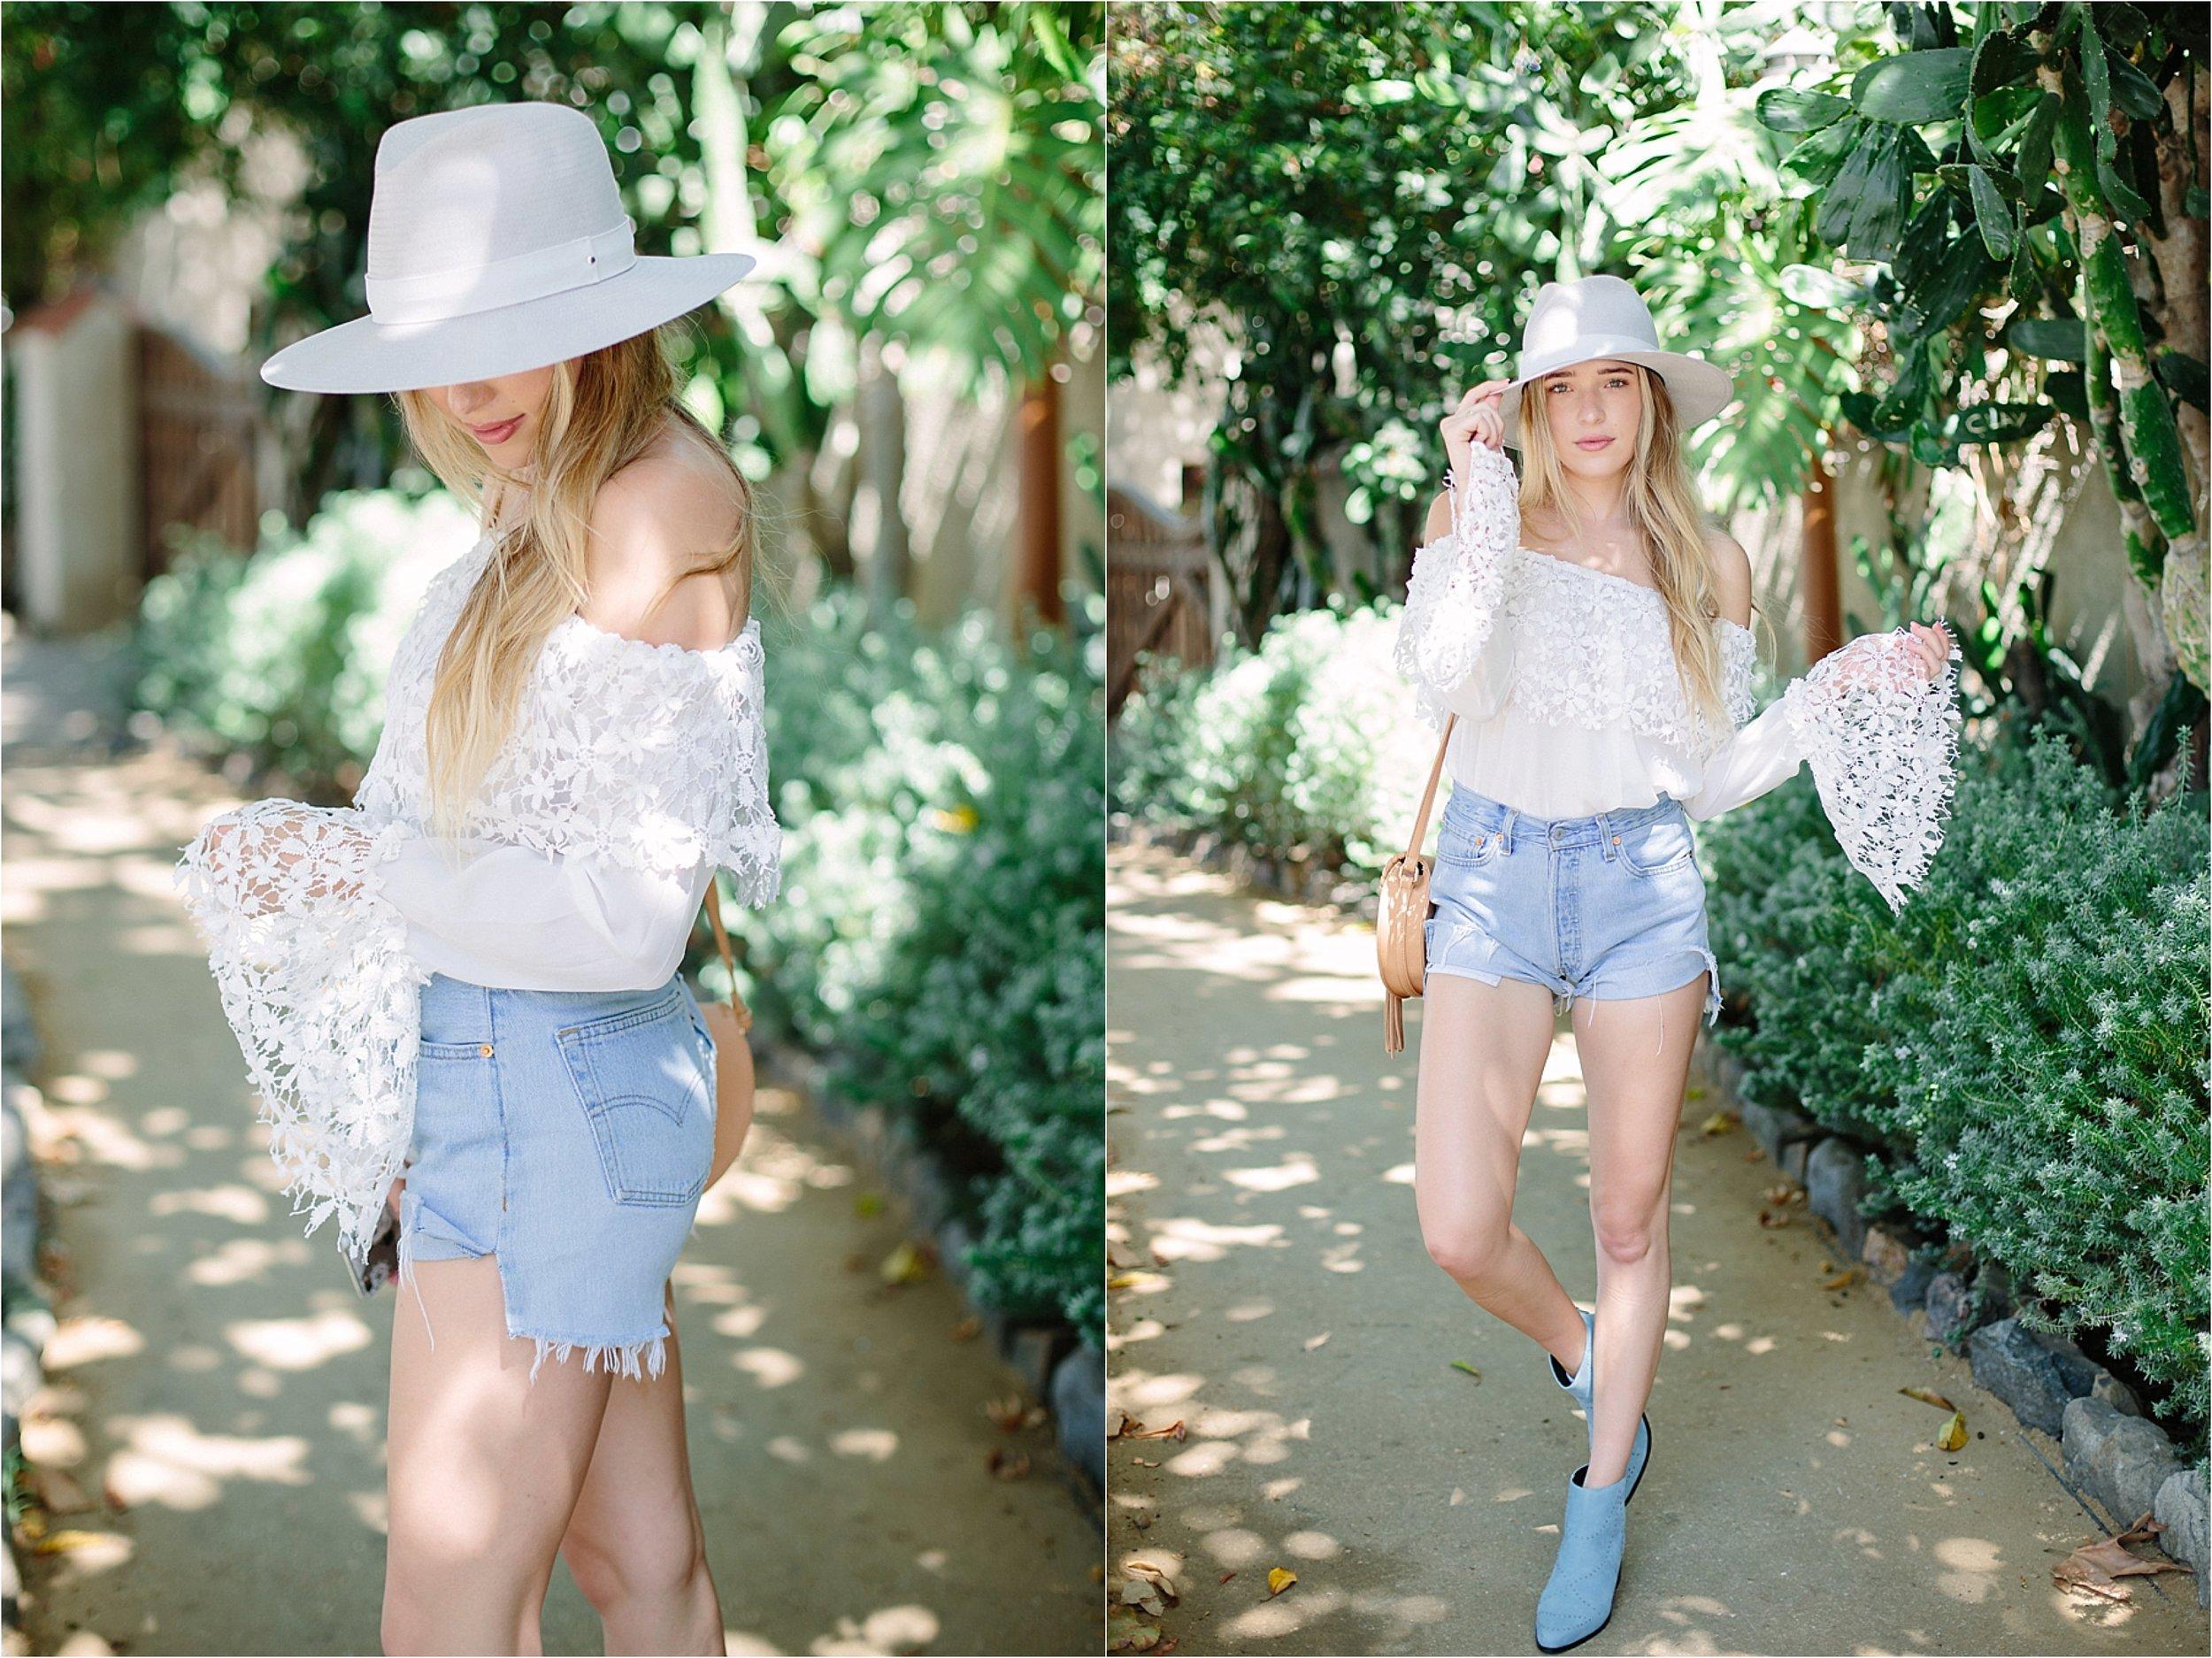 The Grove LA Fashion Photo Shoot